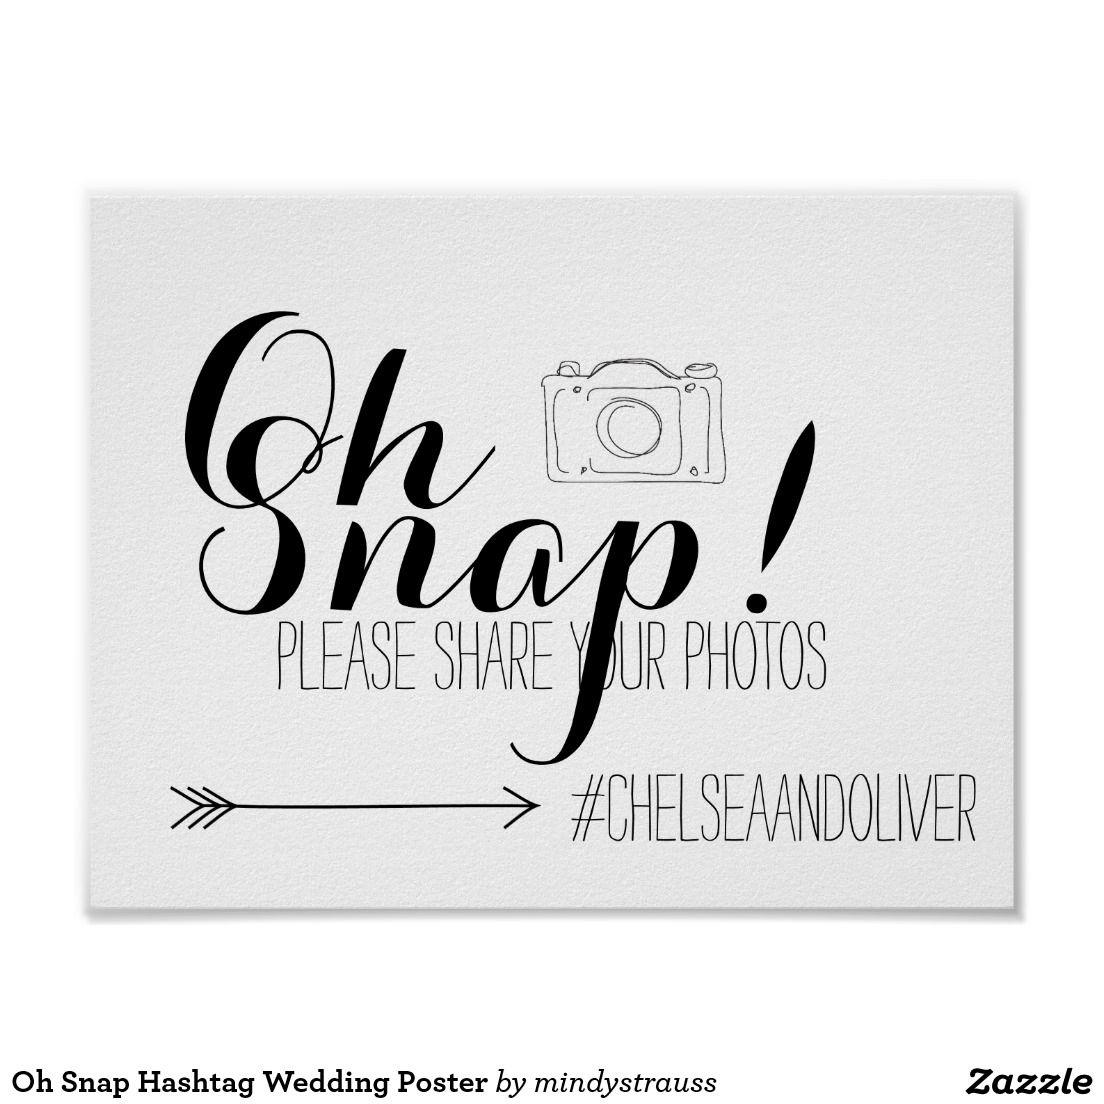 Oh Snap Hashtag Wedding Poster Wedding